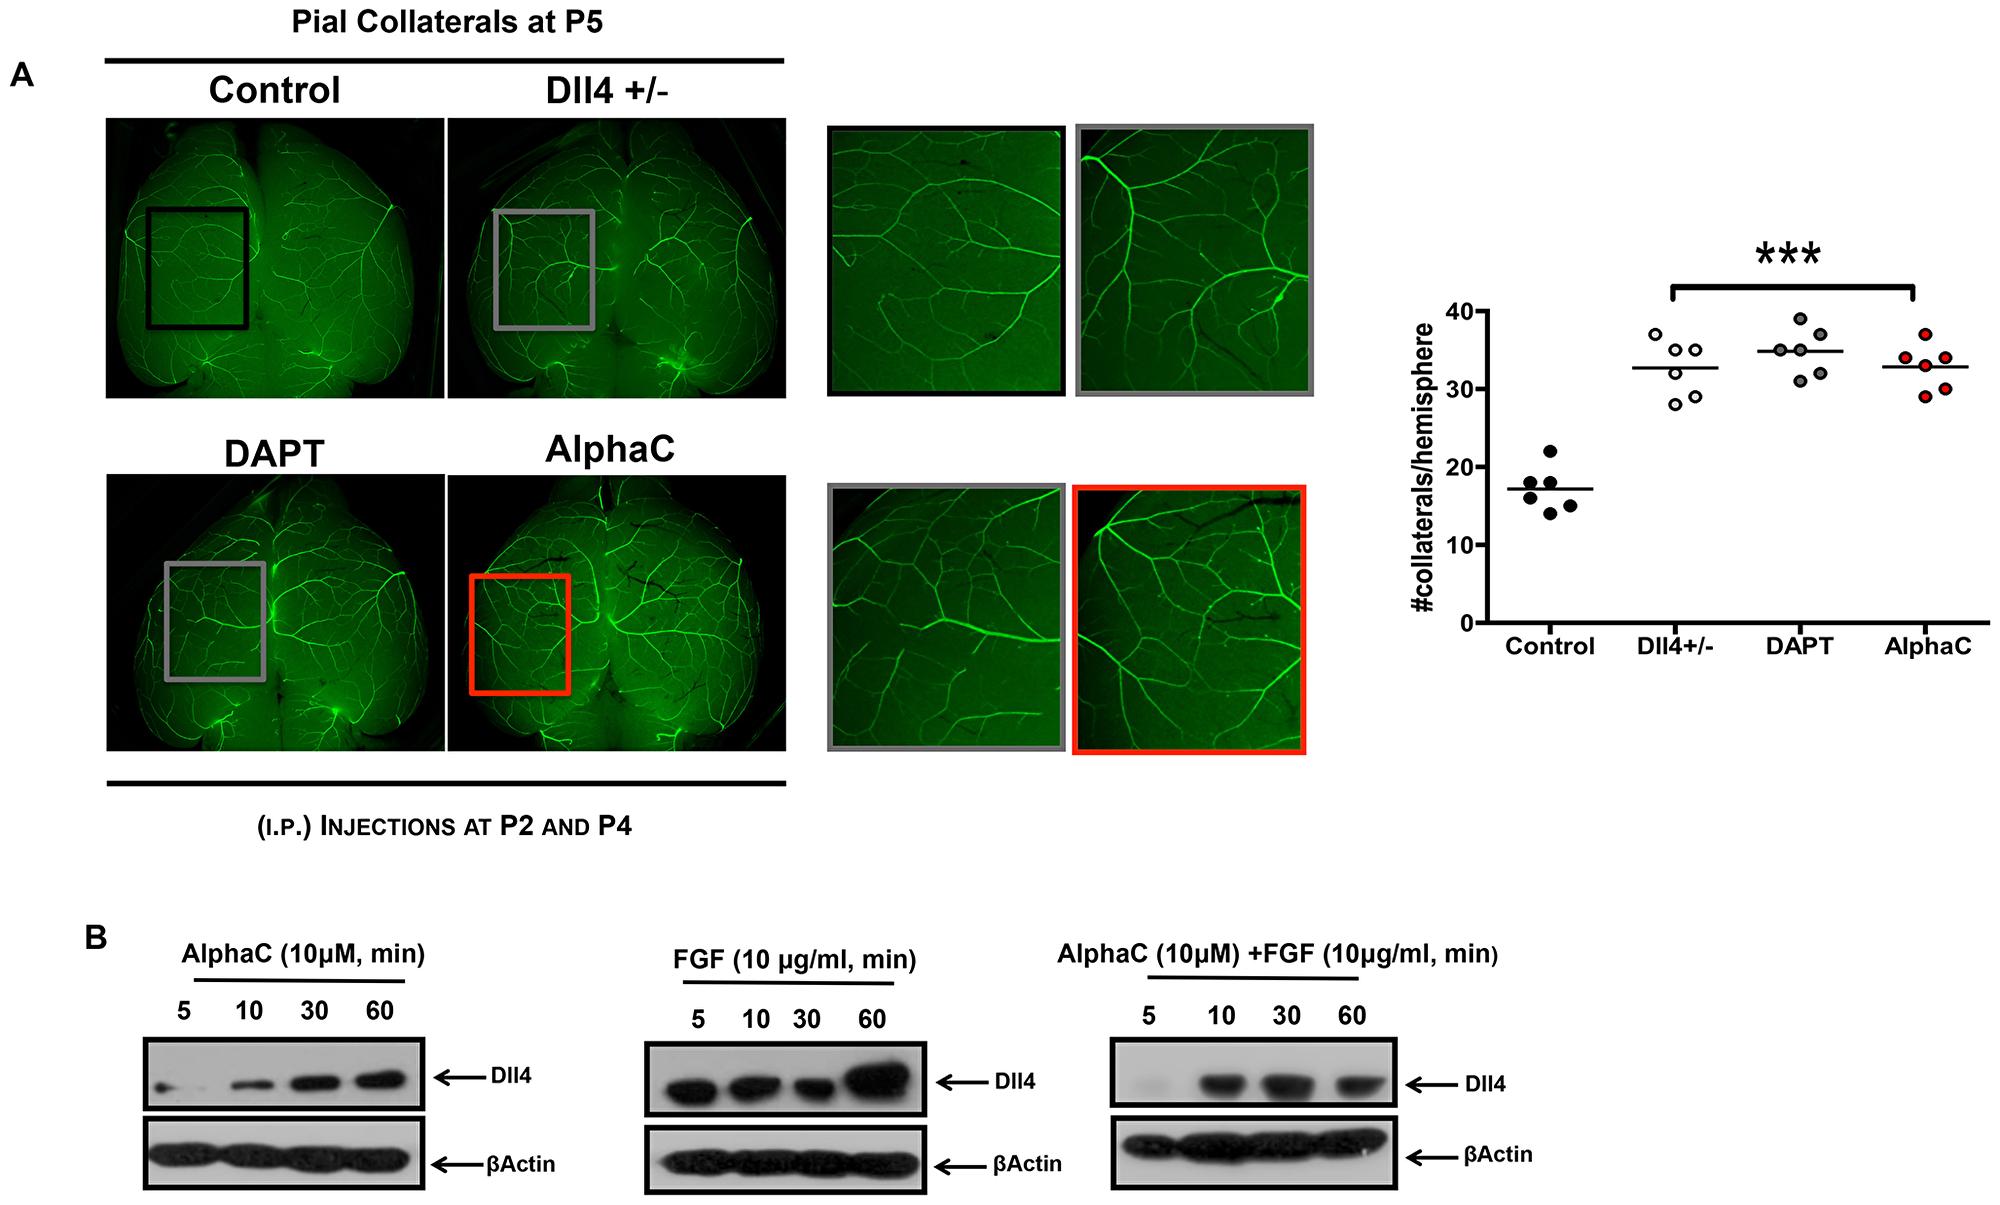 Alphastatin-C increases pial arteriolar formation in vivo.